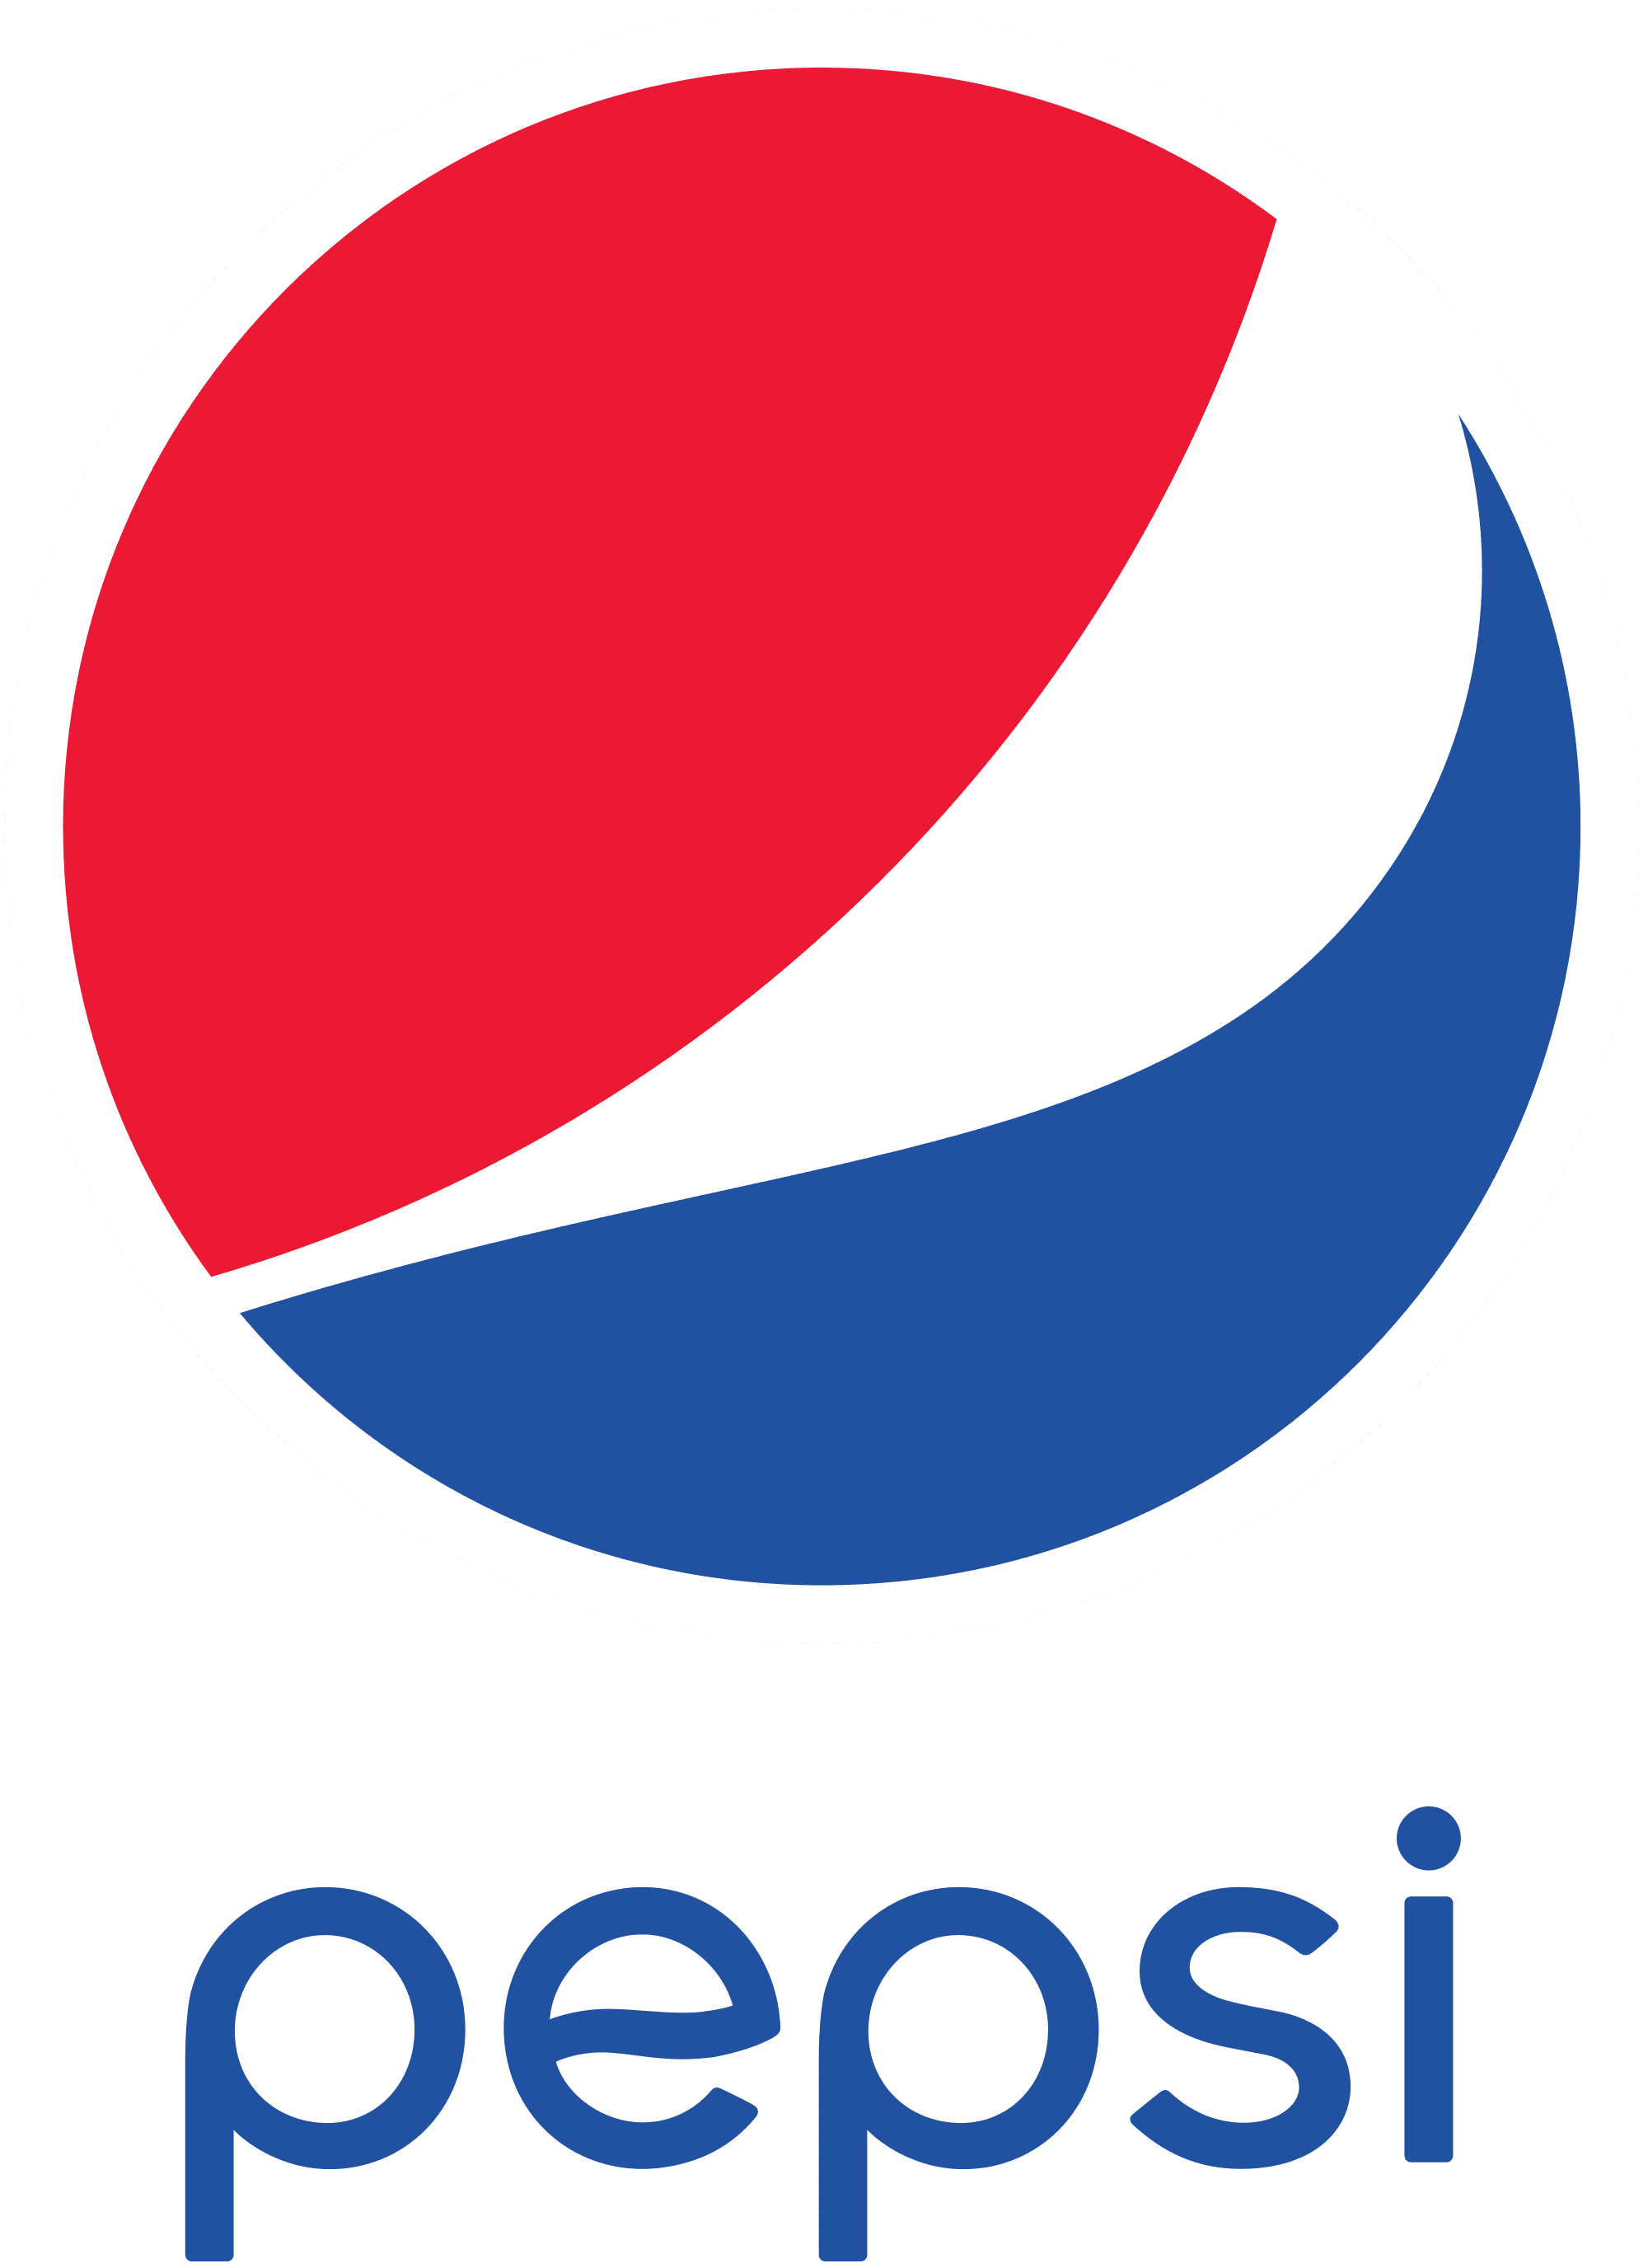 logo pepsi agence creads